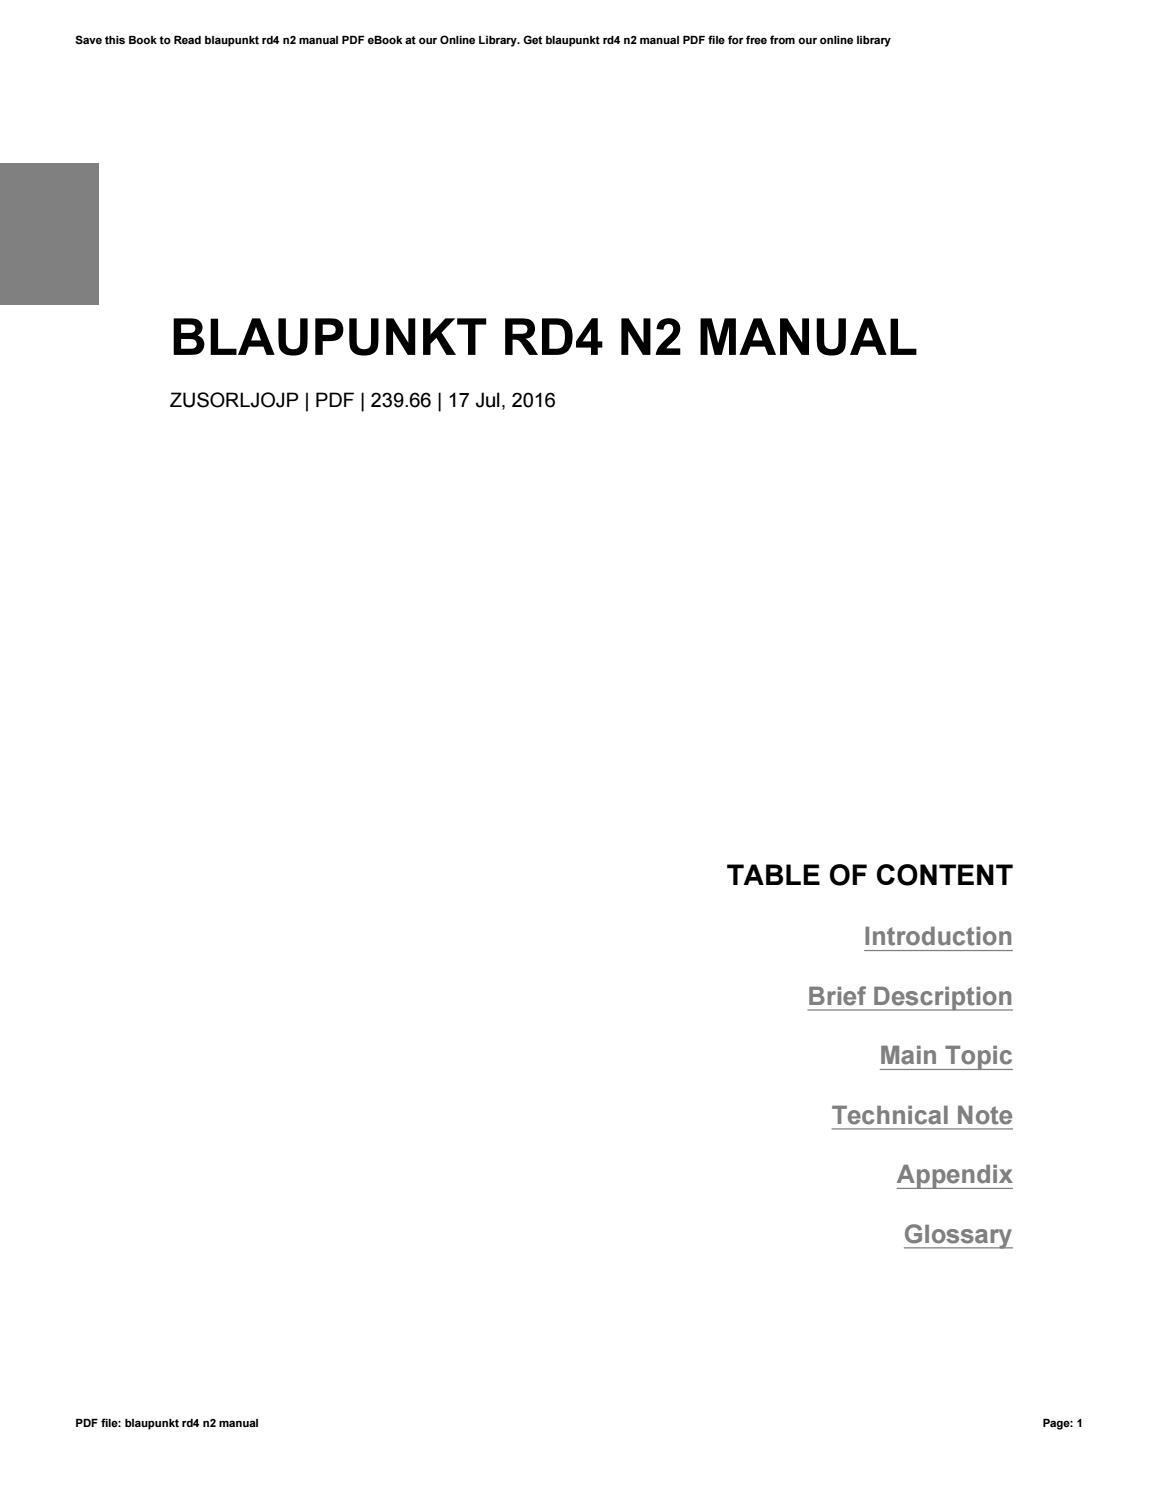 manuale blaupunkt rd4 n1 daily instruction manual guides u2022 rh testingwordpress co Rd4 Wheel Rd4 Wheel